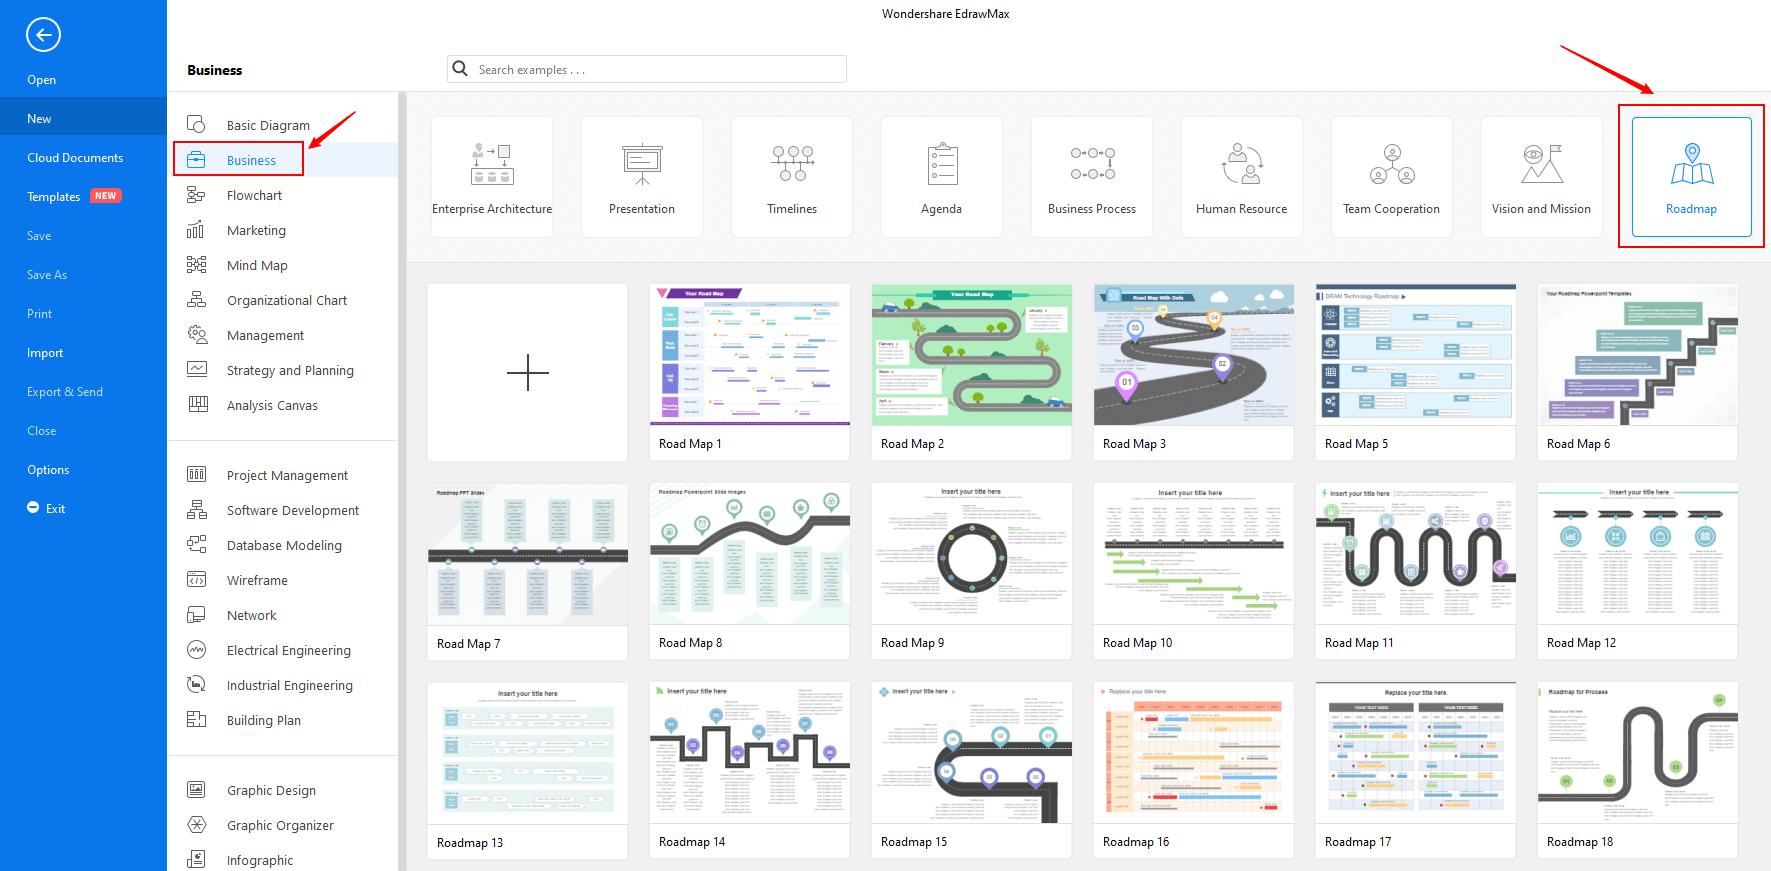 Open business roadmap template